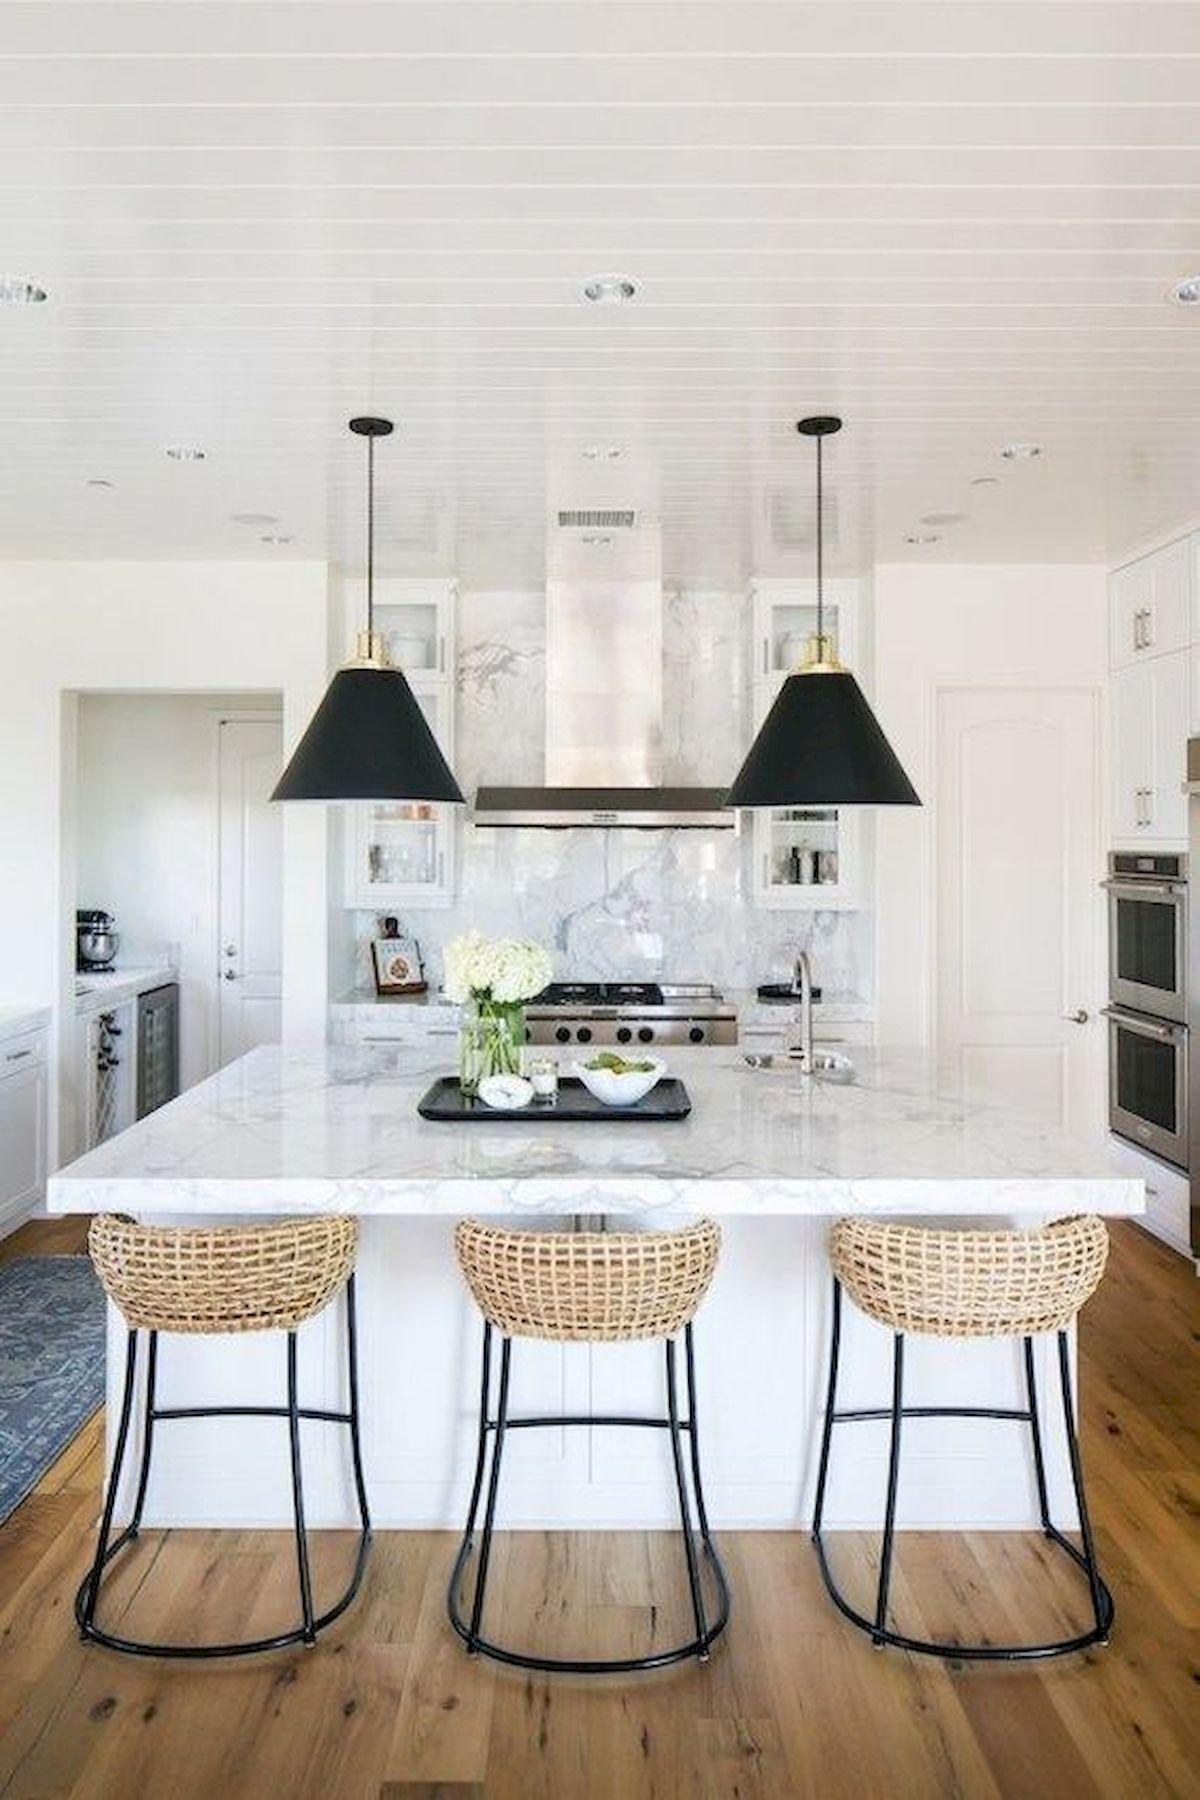 80 Elegant Modern Dining Room Design And Decor Ideas (59)